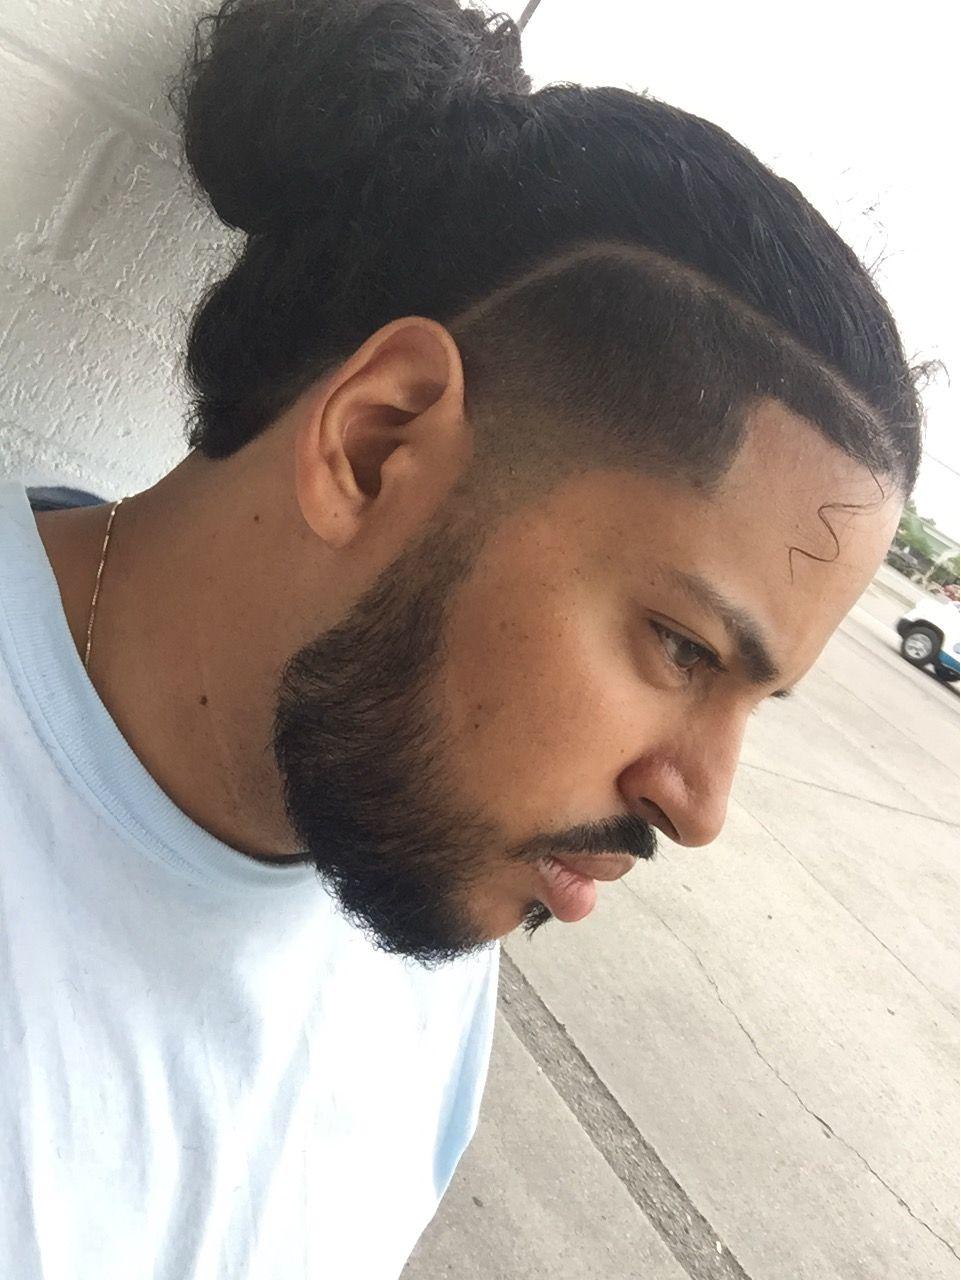 Man Bun X Temp Fade Taper Fade Beard Gang Cool Hairstyles For Men Mens Hairstyles Mens Hairstyles Fade